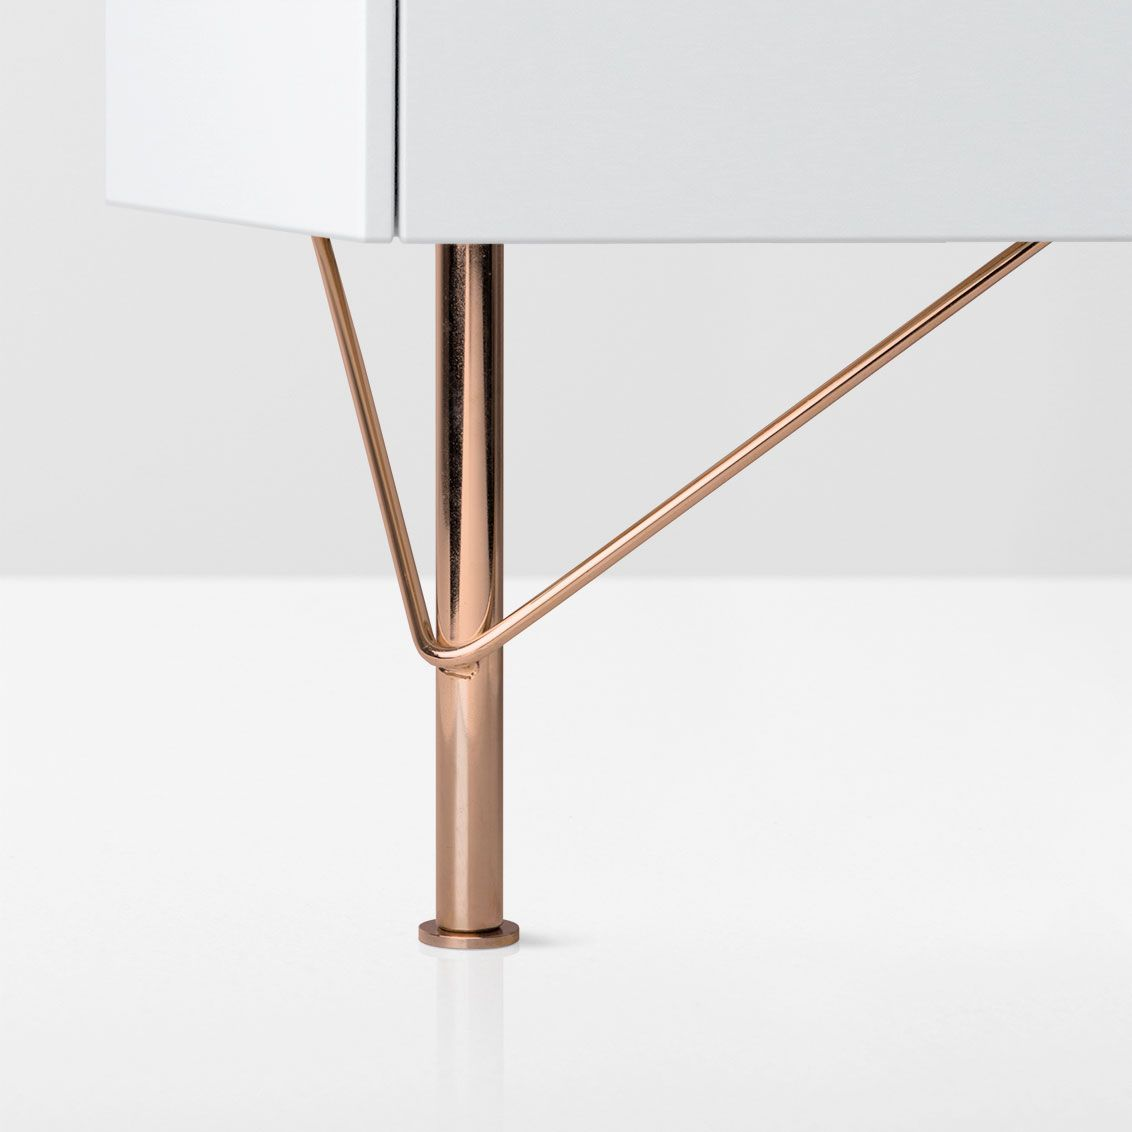 Slender Low Brass Furniture Legs Metal Furniture Legs Furniture Legs [ 1132 x 1132 Pixel ]